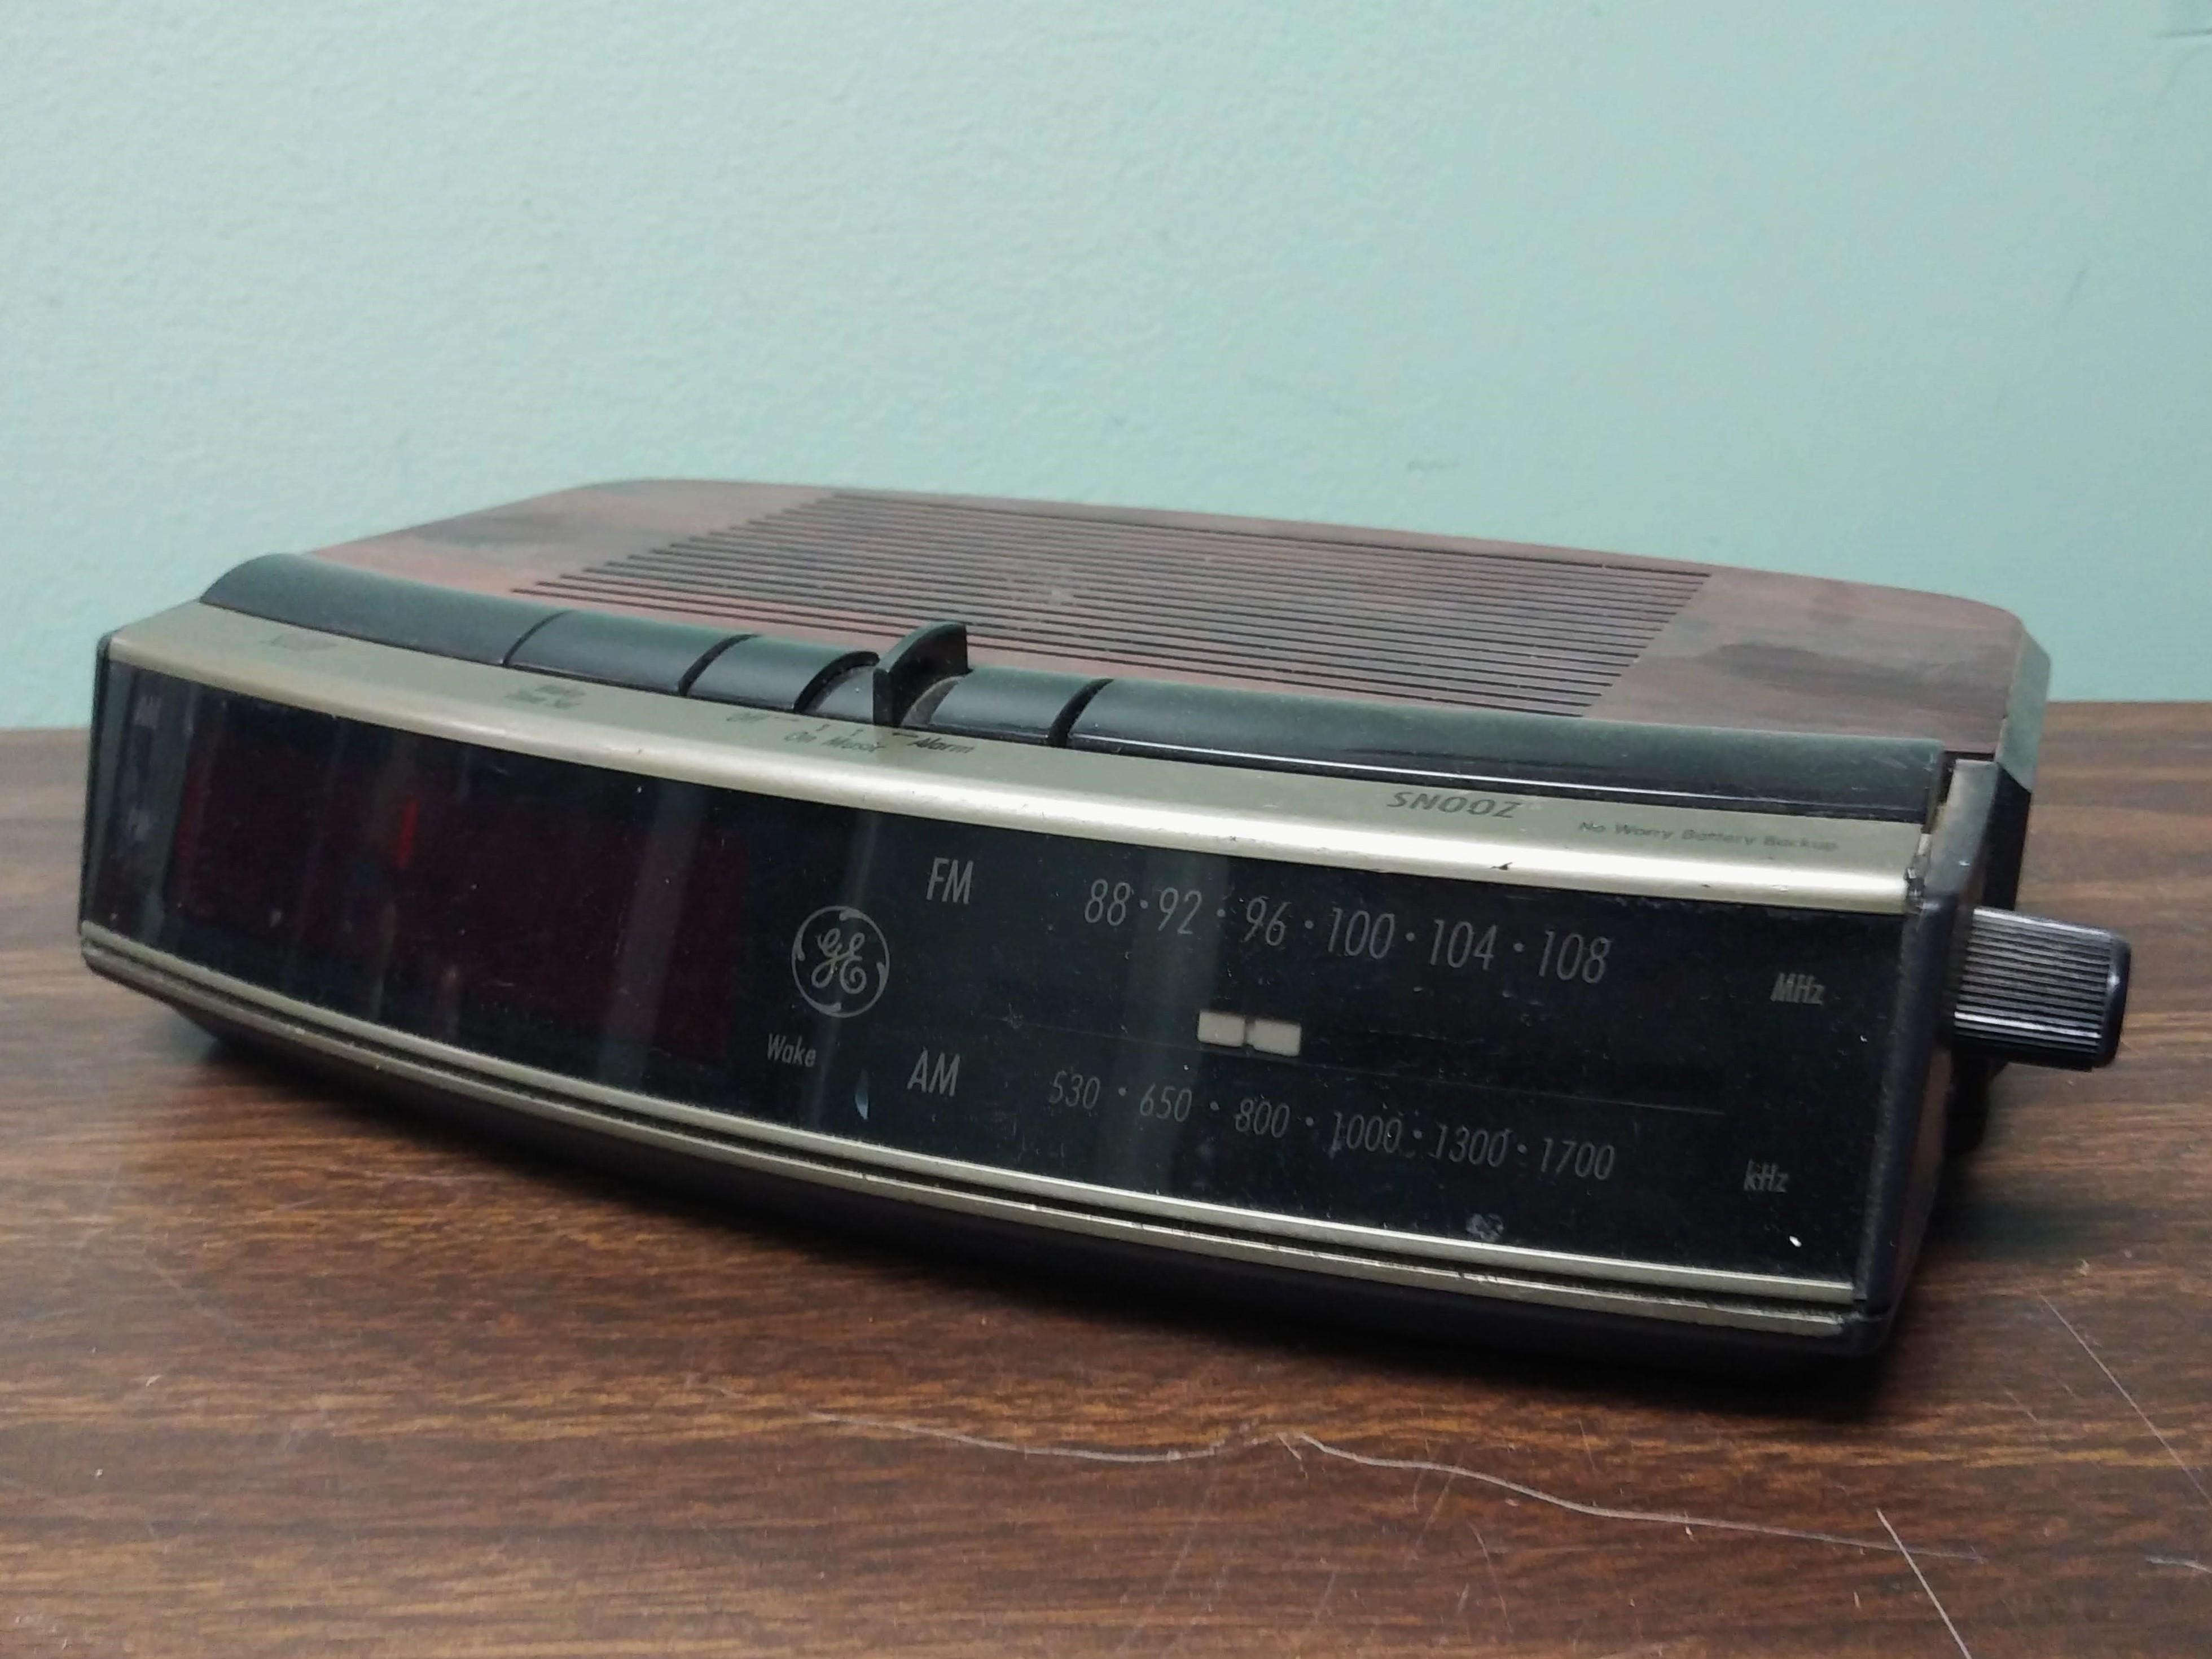 GE Digital Alarm Clock Radio 1980s